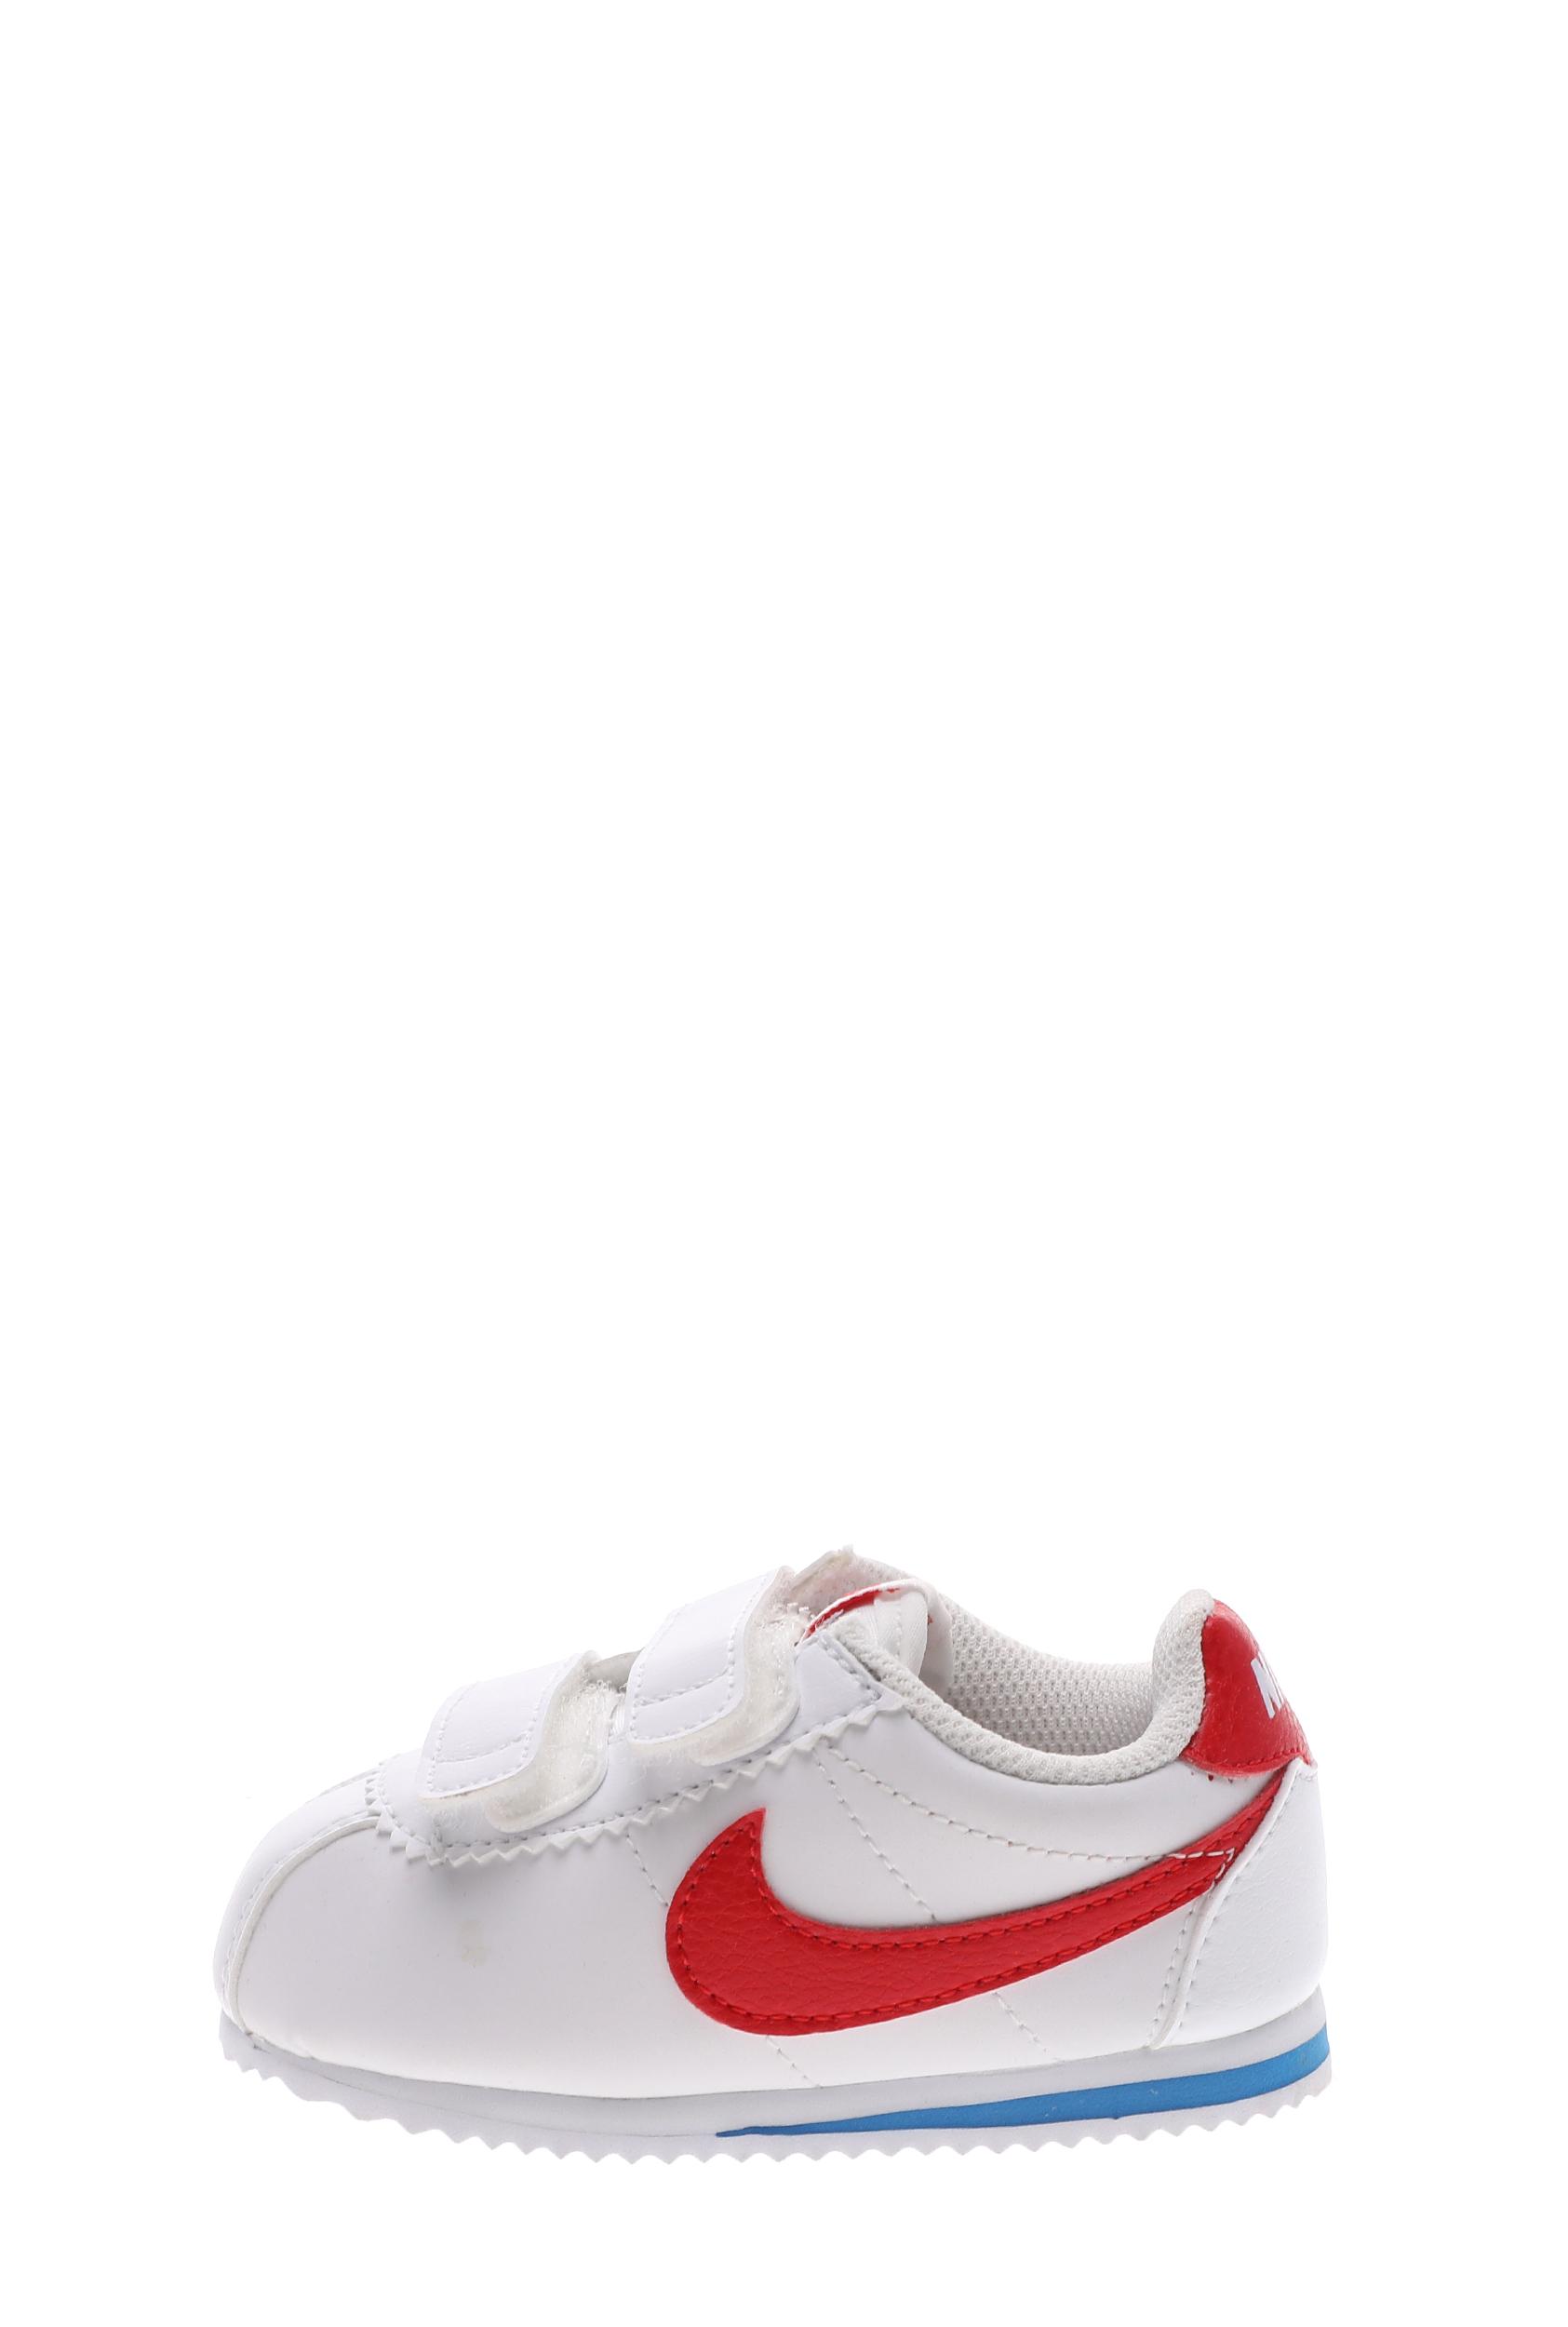 NIKE – Βρεφικά αθλητικά παπούτσια NIKE CORTEZ (TDV) λευκά